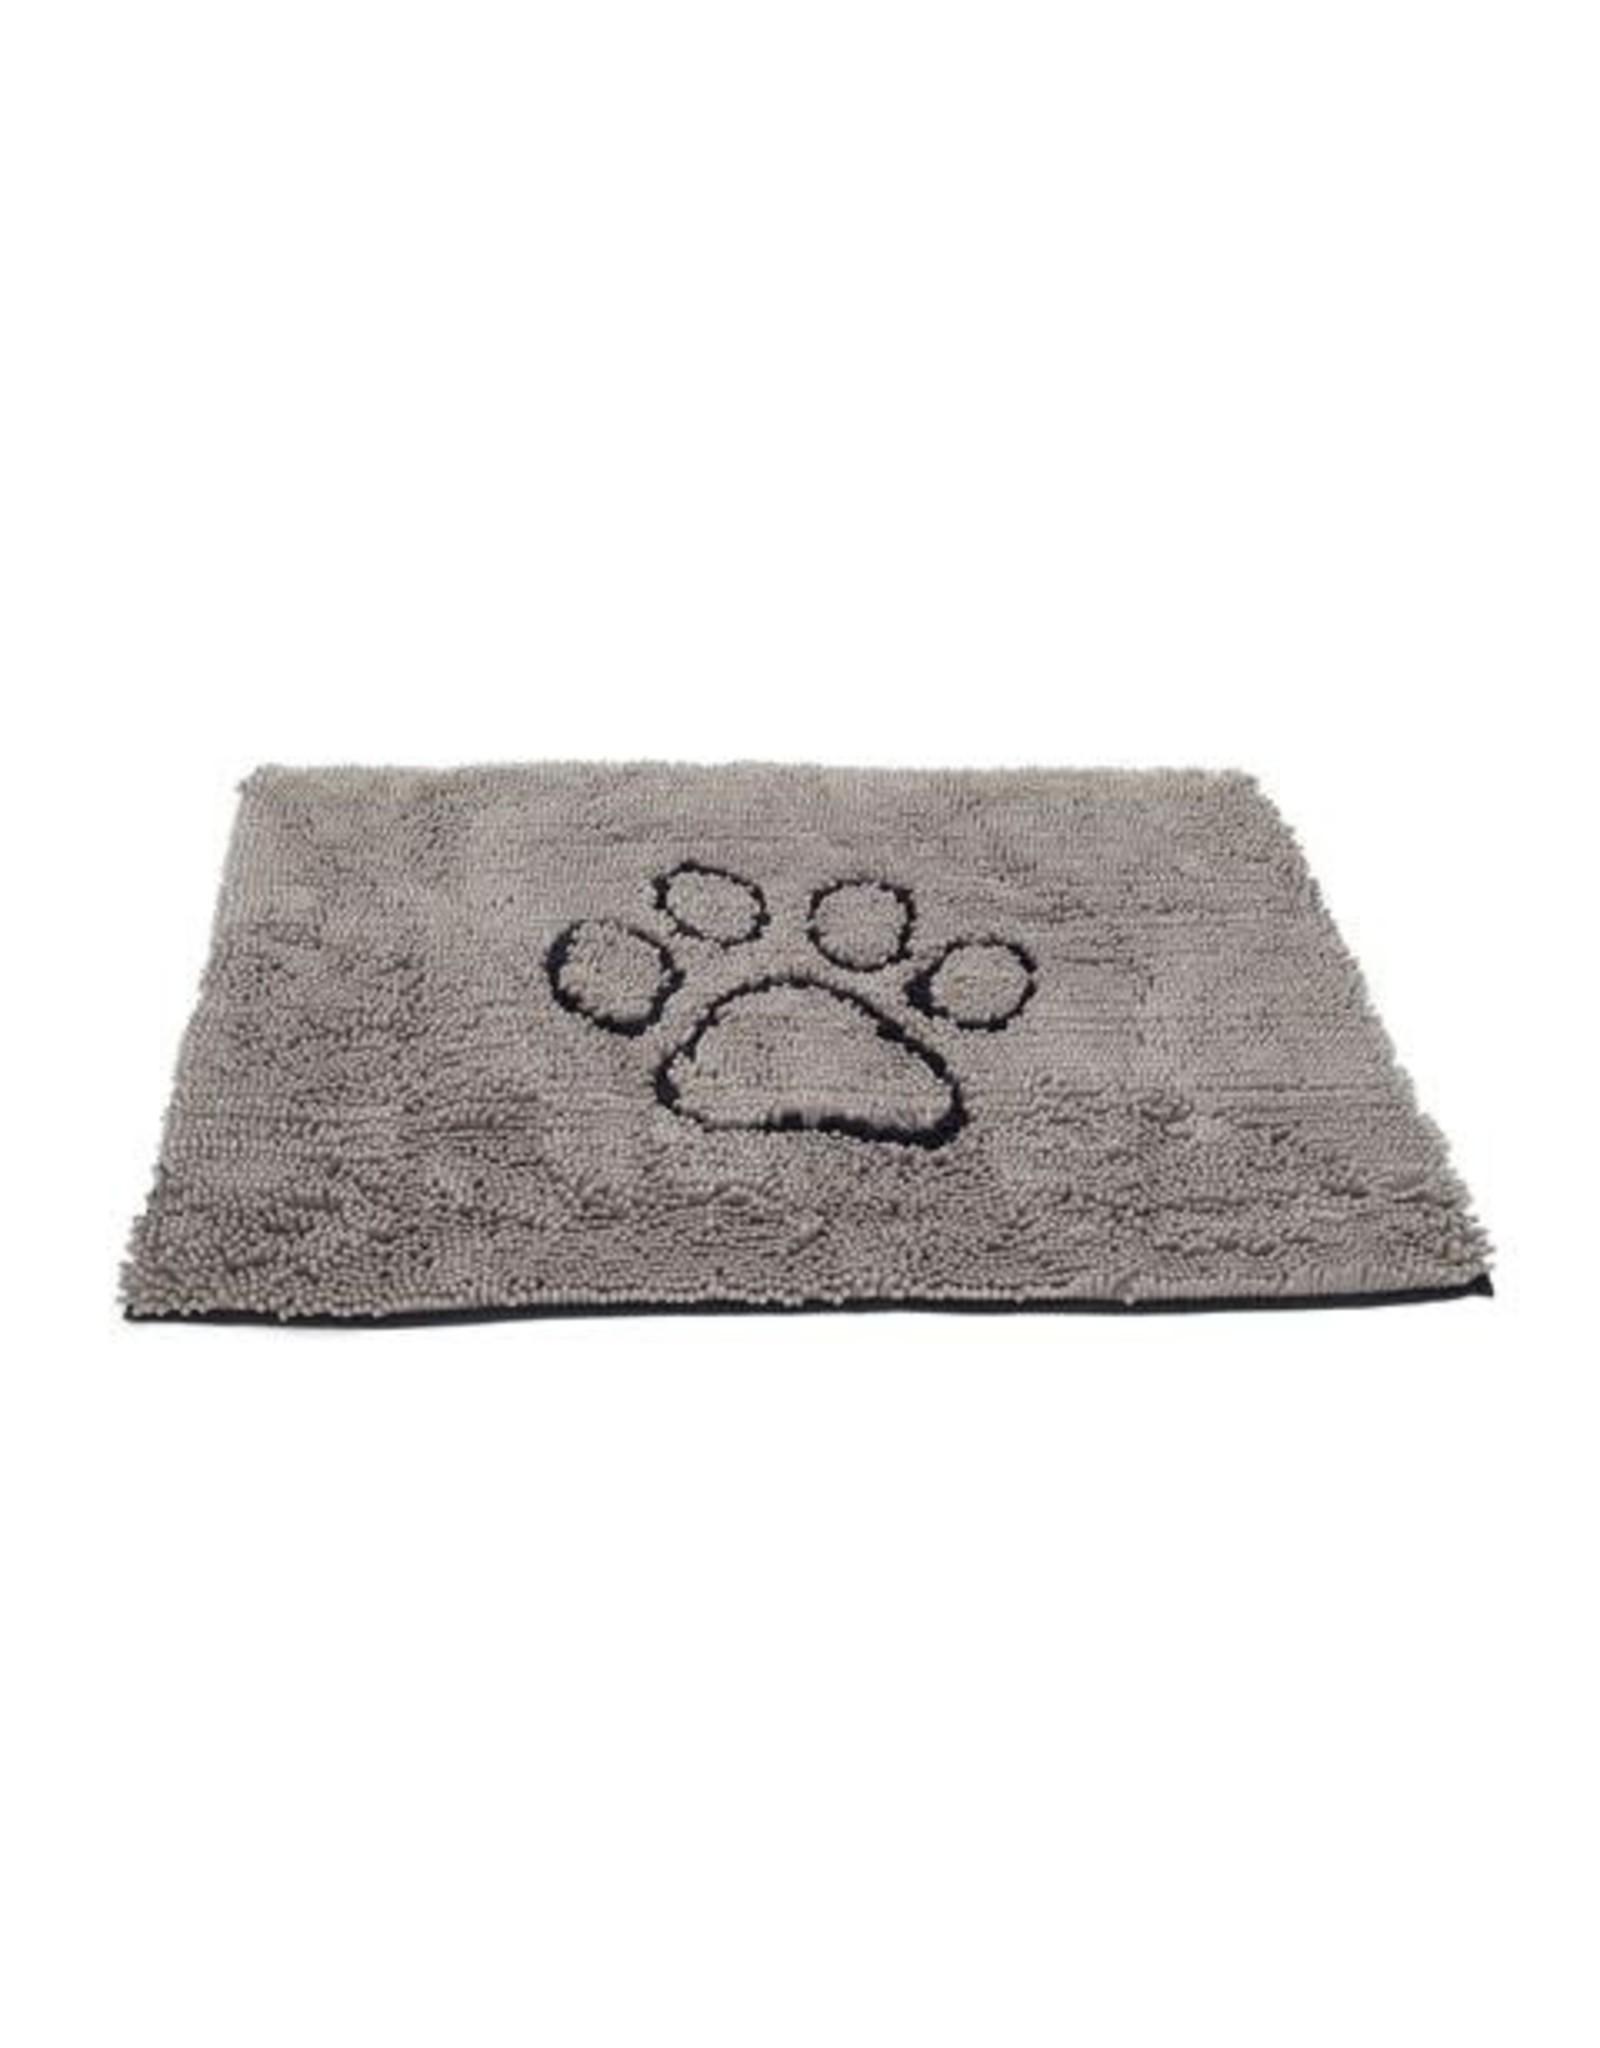 Dog Gone Smart DGS \ Dirty Dog Doormat \ Medium 20 x 31 \ Grey